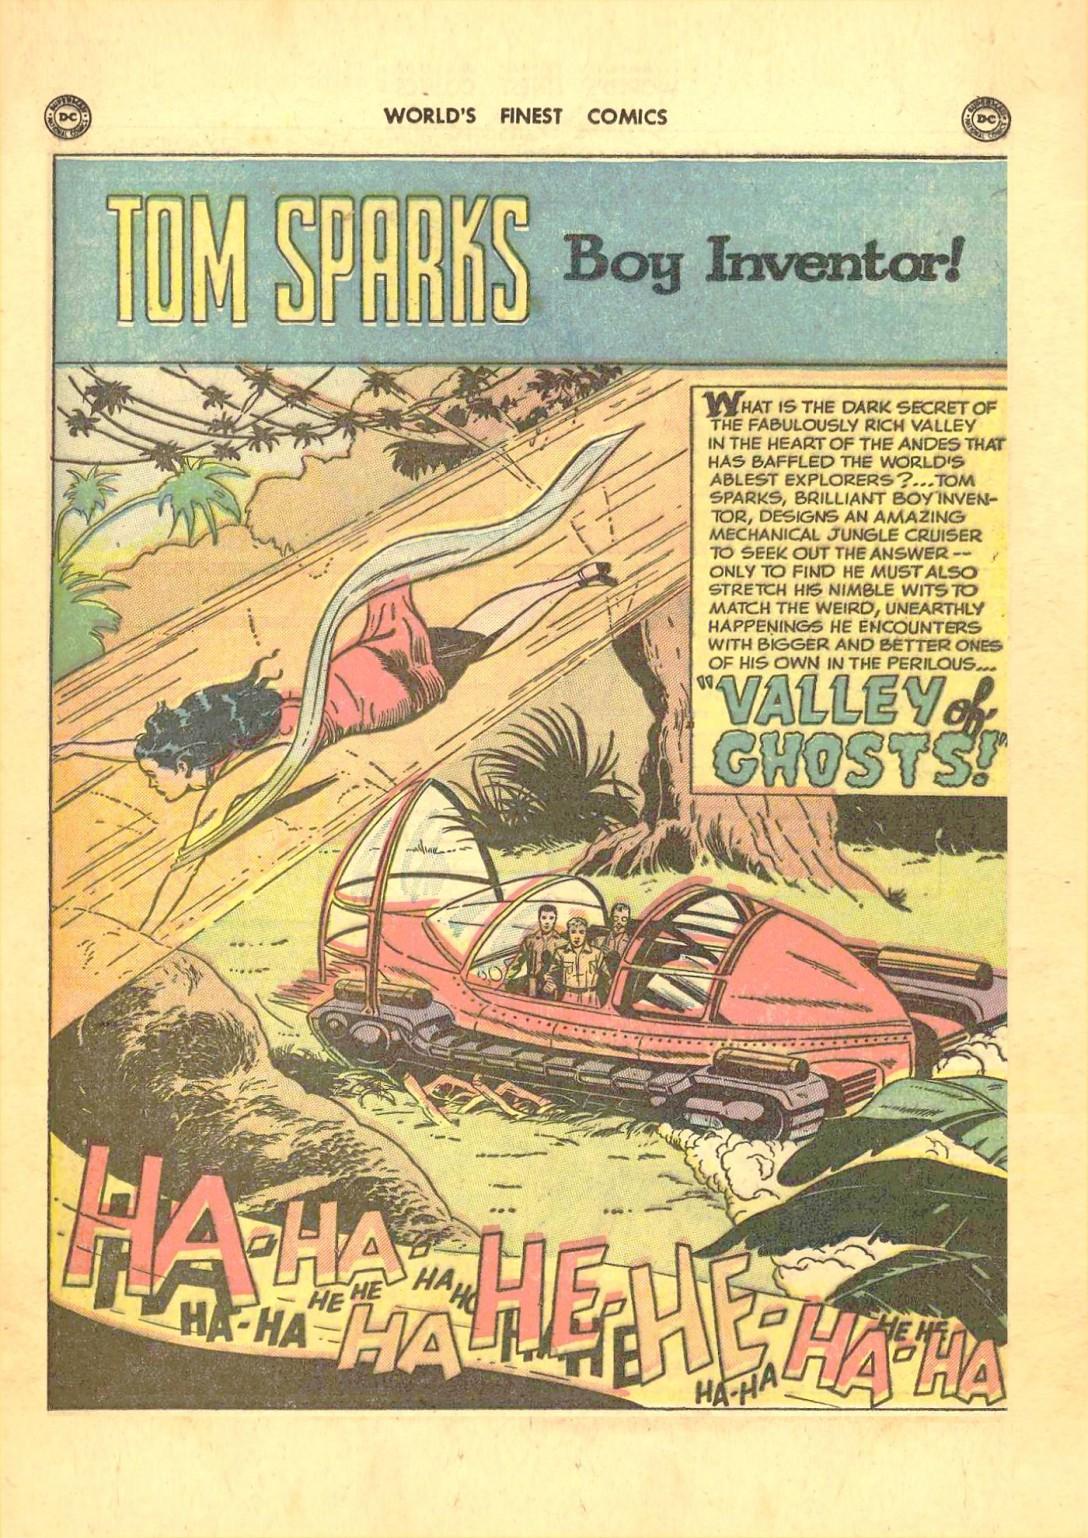 Read online World's Finest Comics comic -  Issue #50 - 29